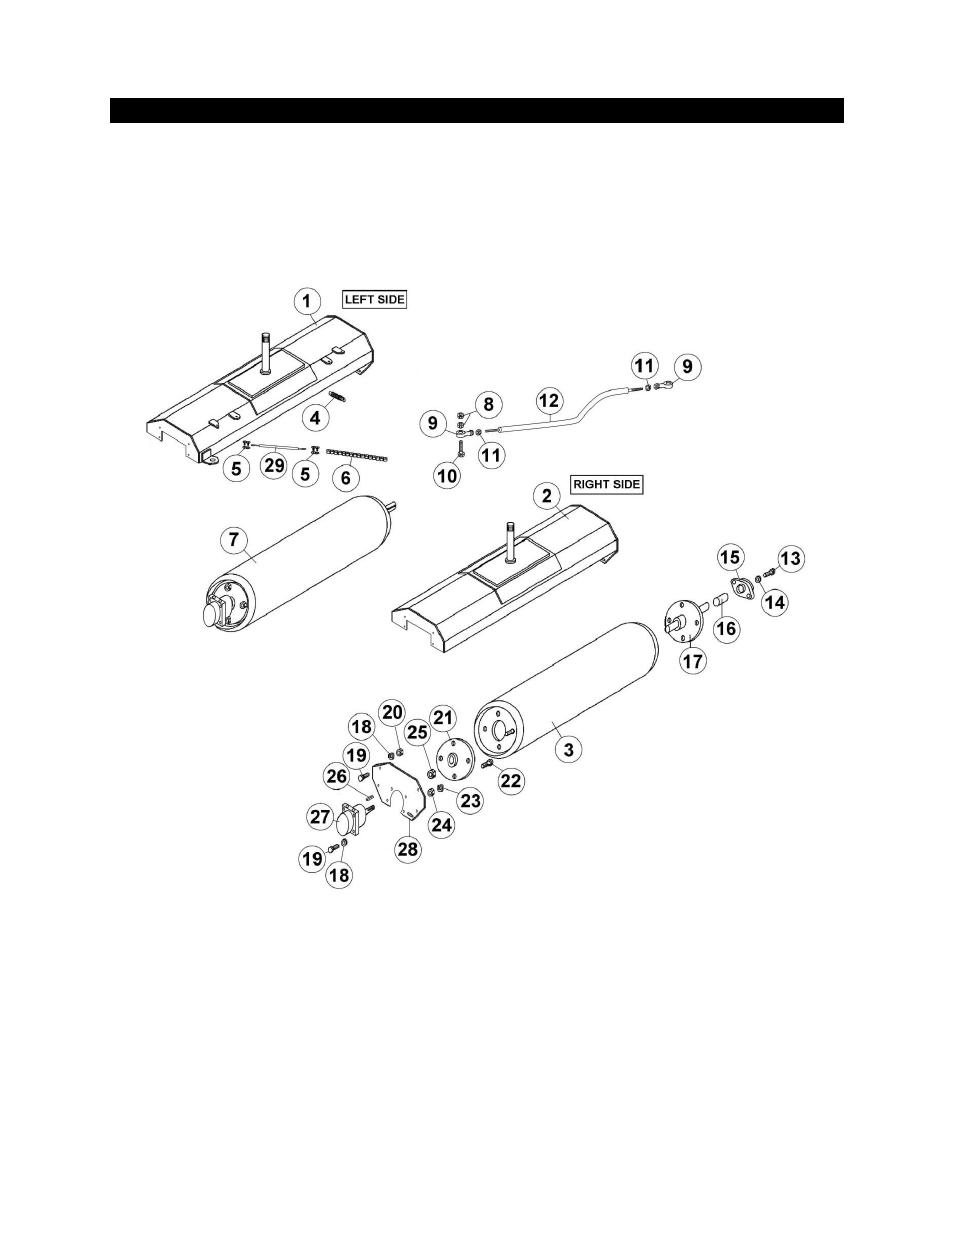 Smithco Tournament Roller Ultra Lite 7575 Parts & Service